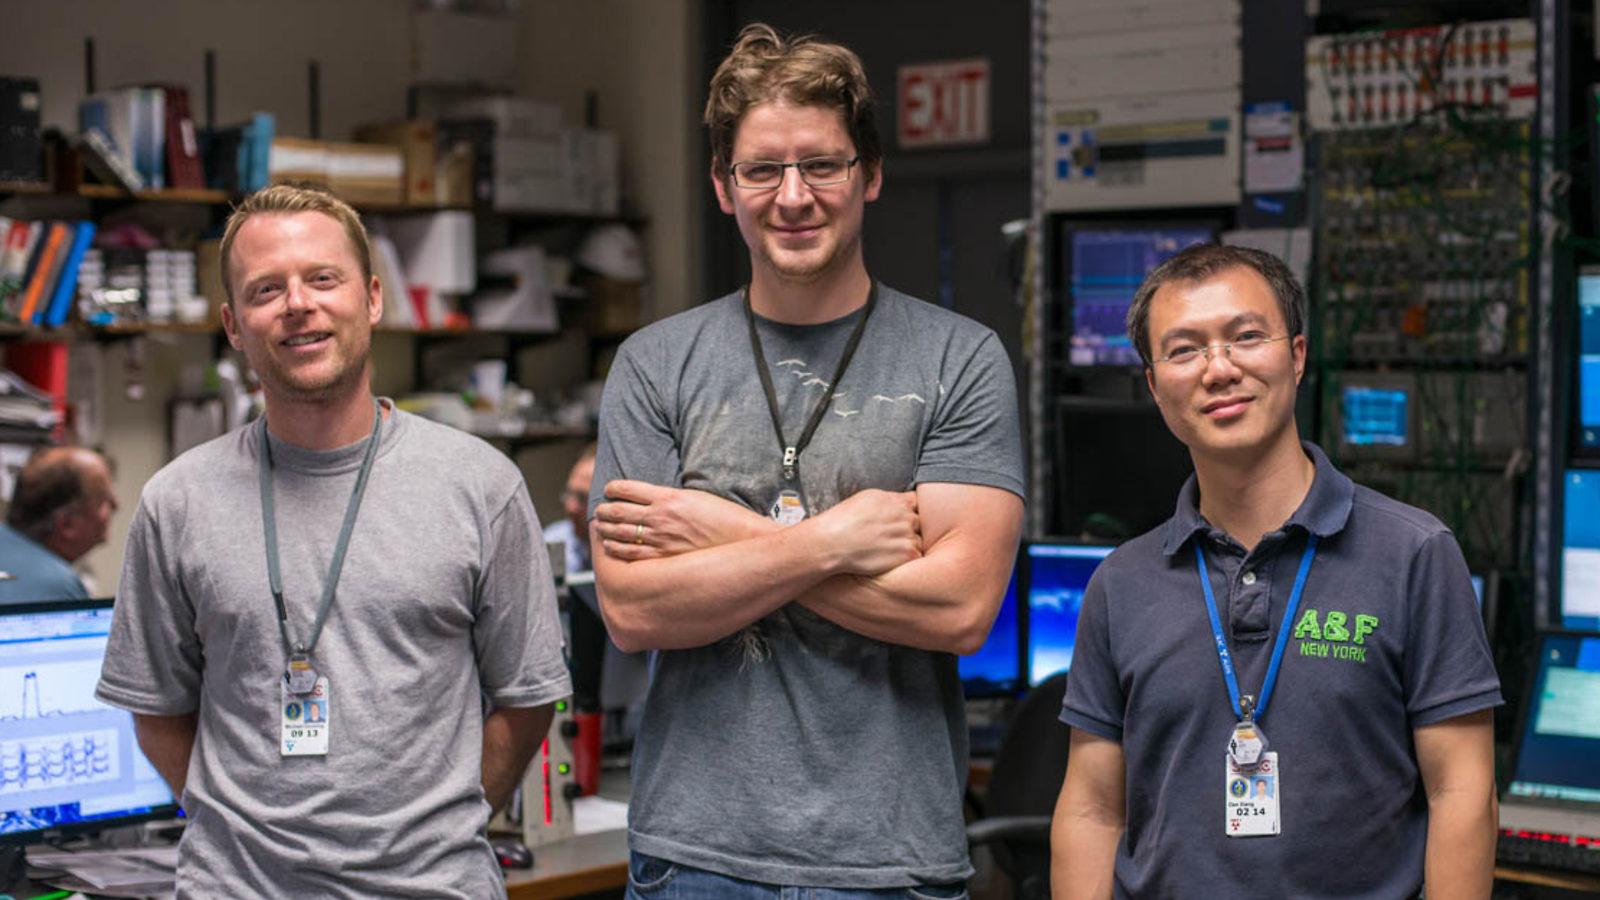 Image: NLCTA modulation team